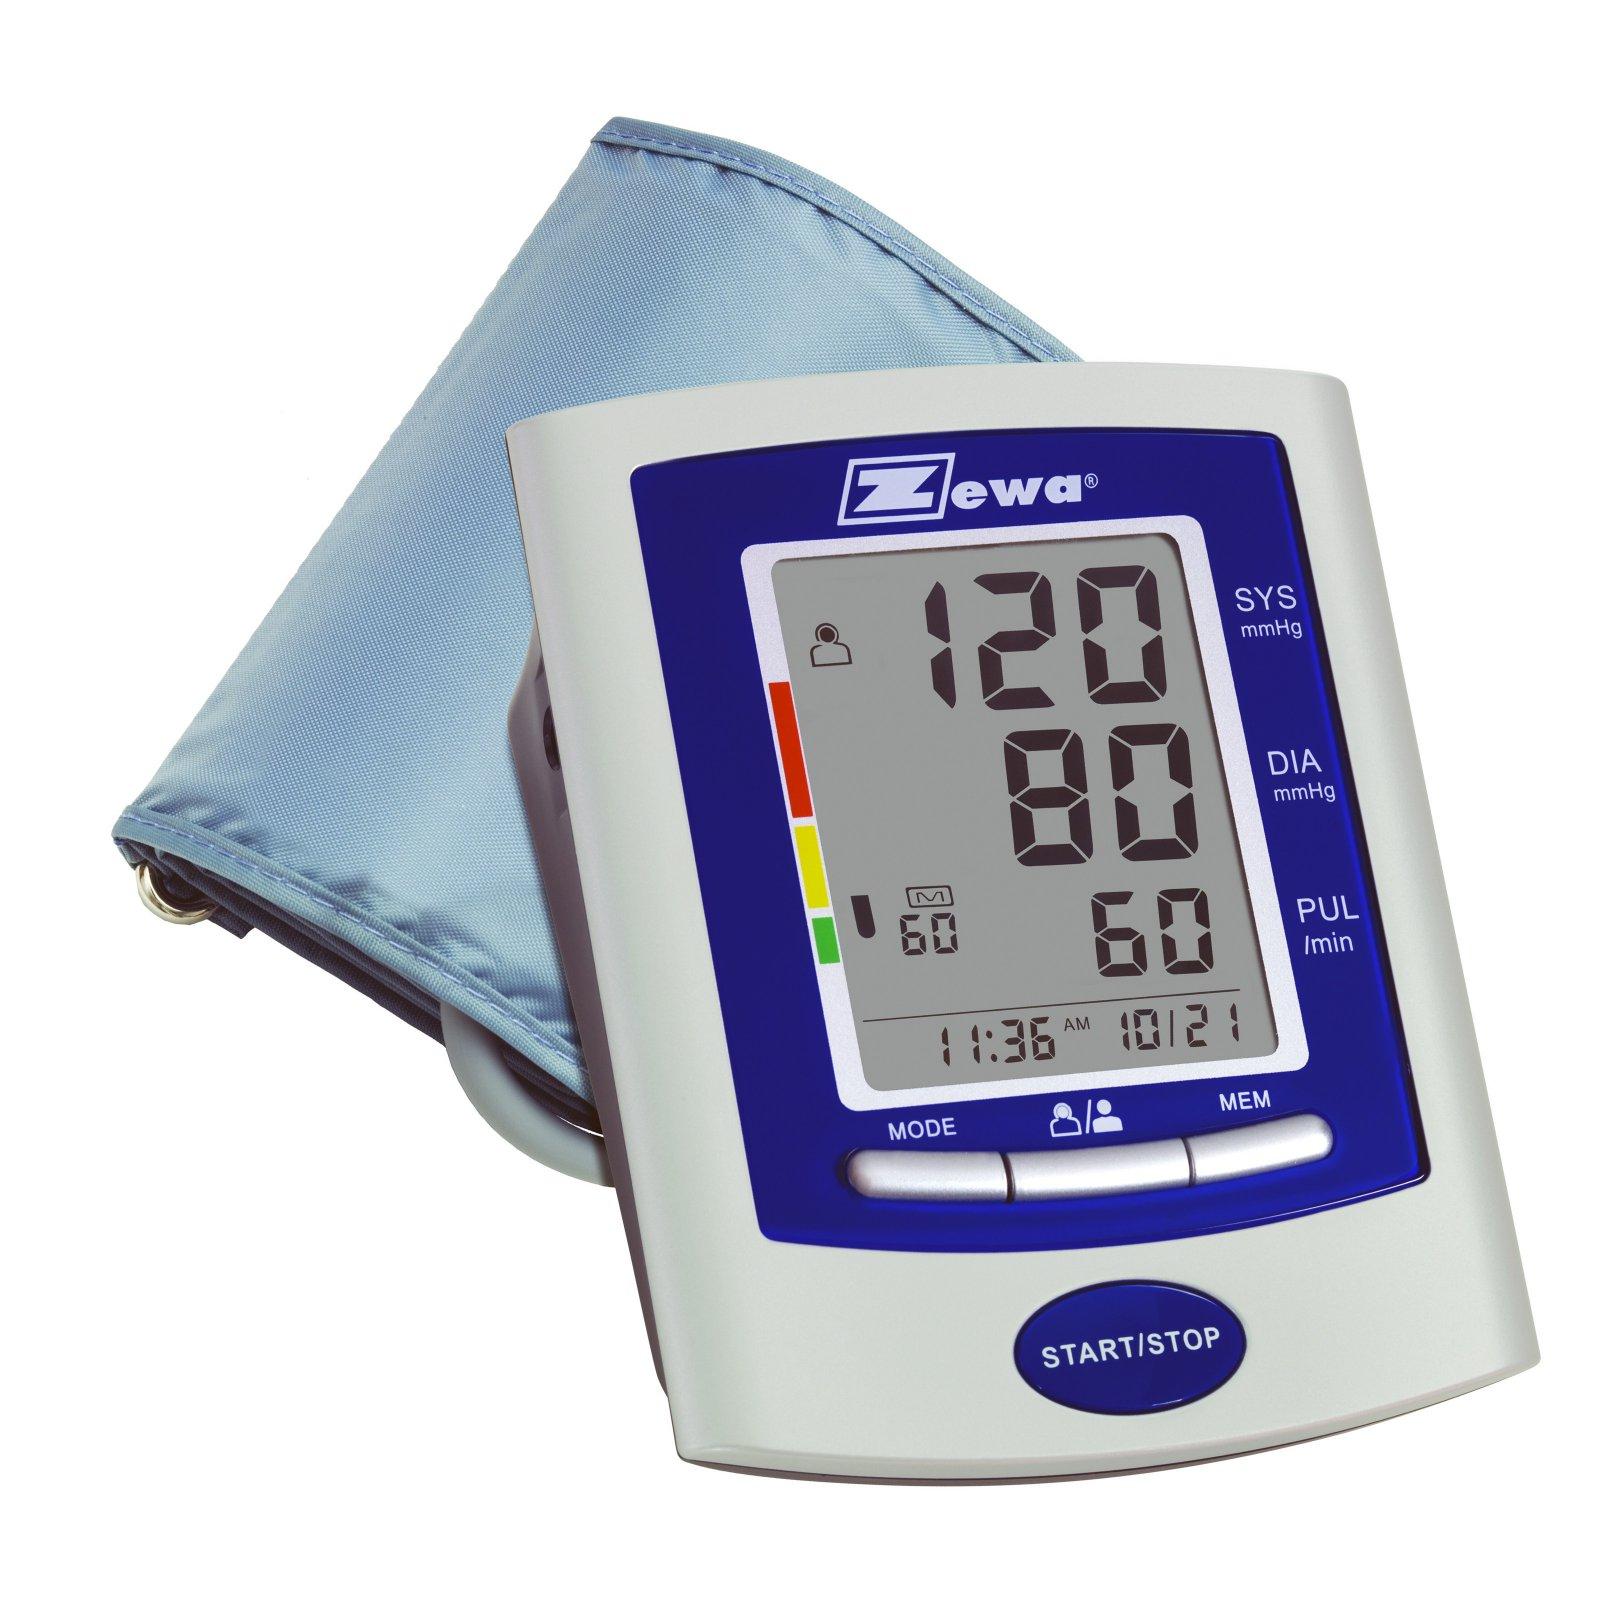 Zewa Automatic Deluxe Model Blood Pressure Monitor, 1ct